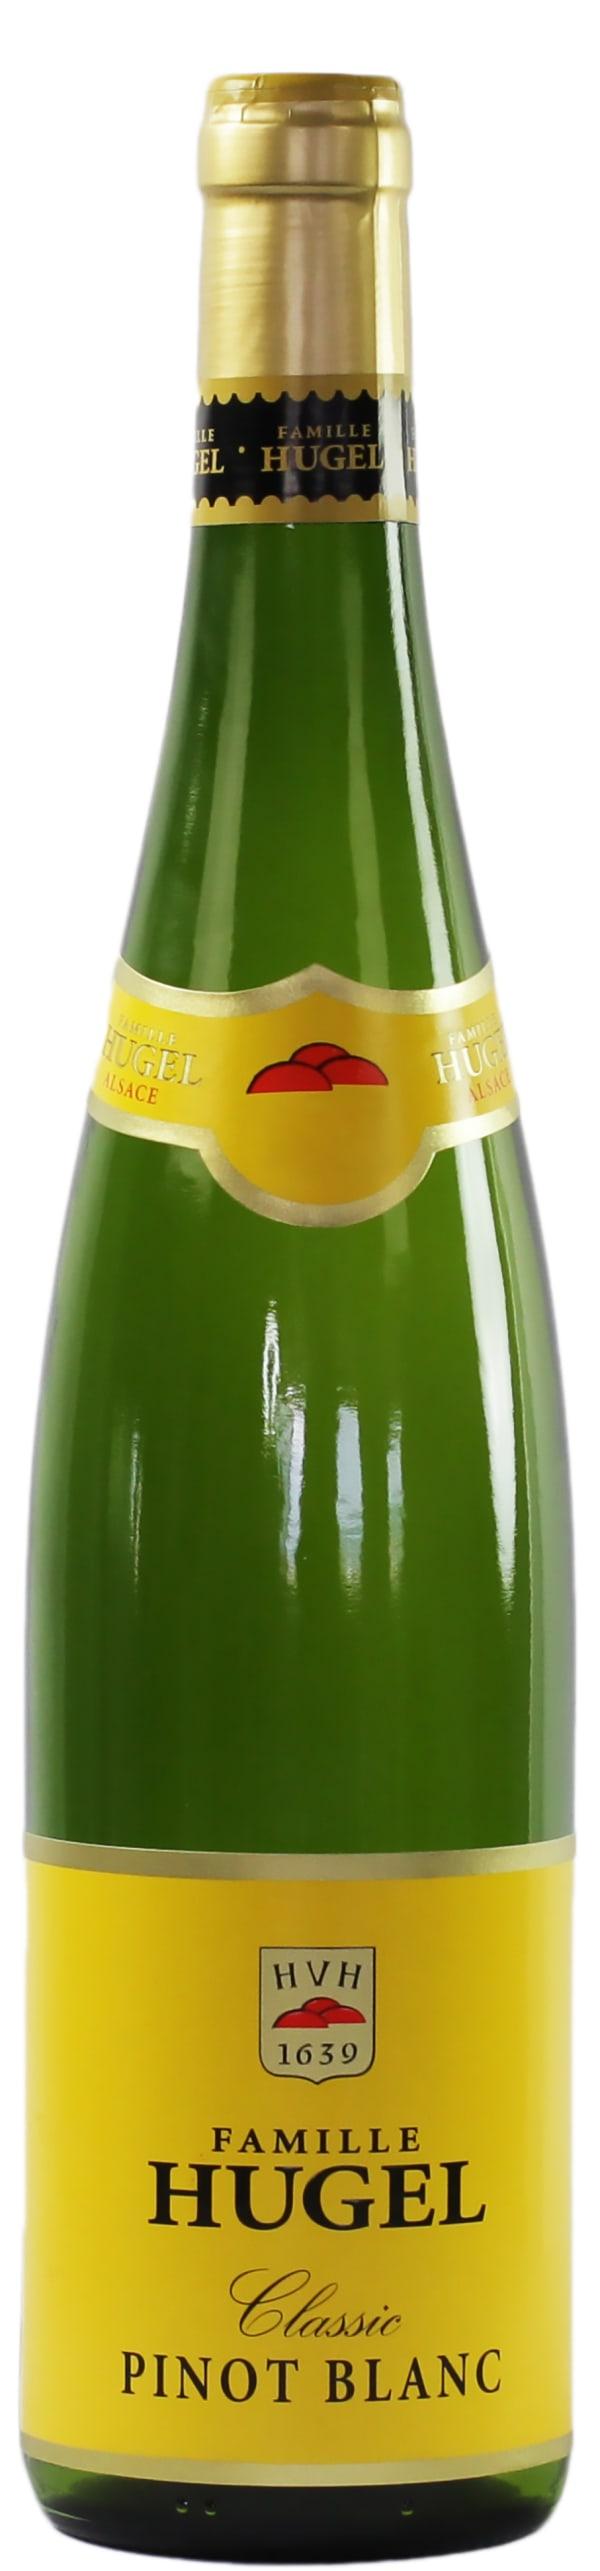 Famille Hugel Classic Pinot Blanc 2015